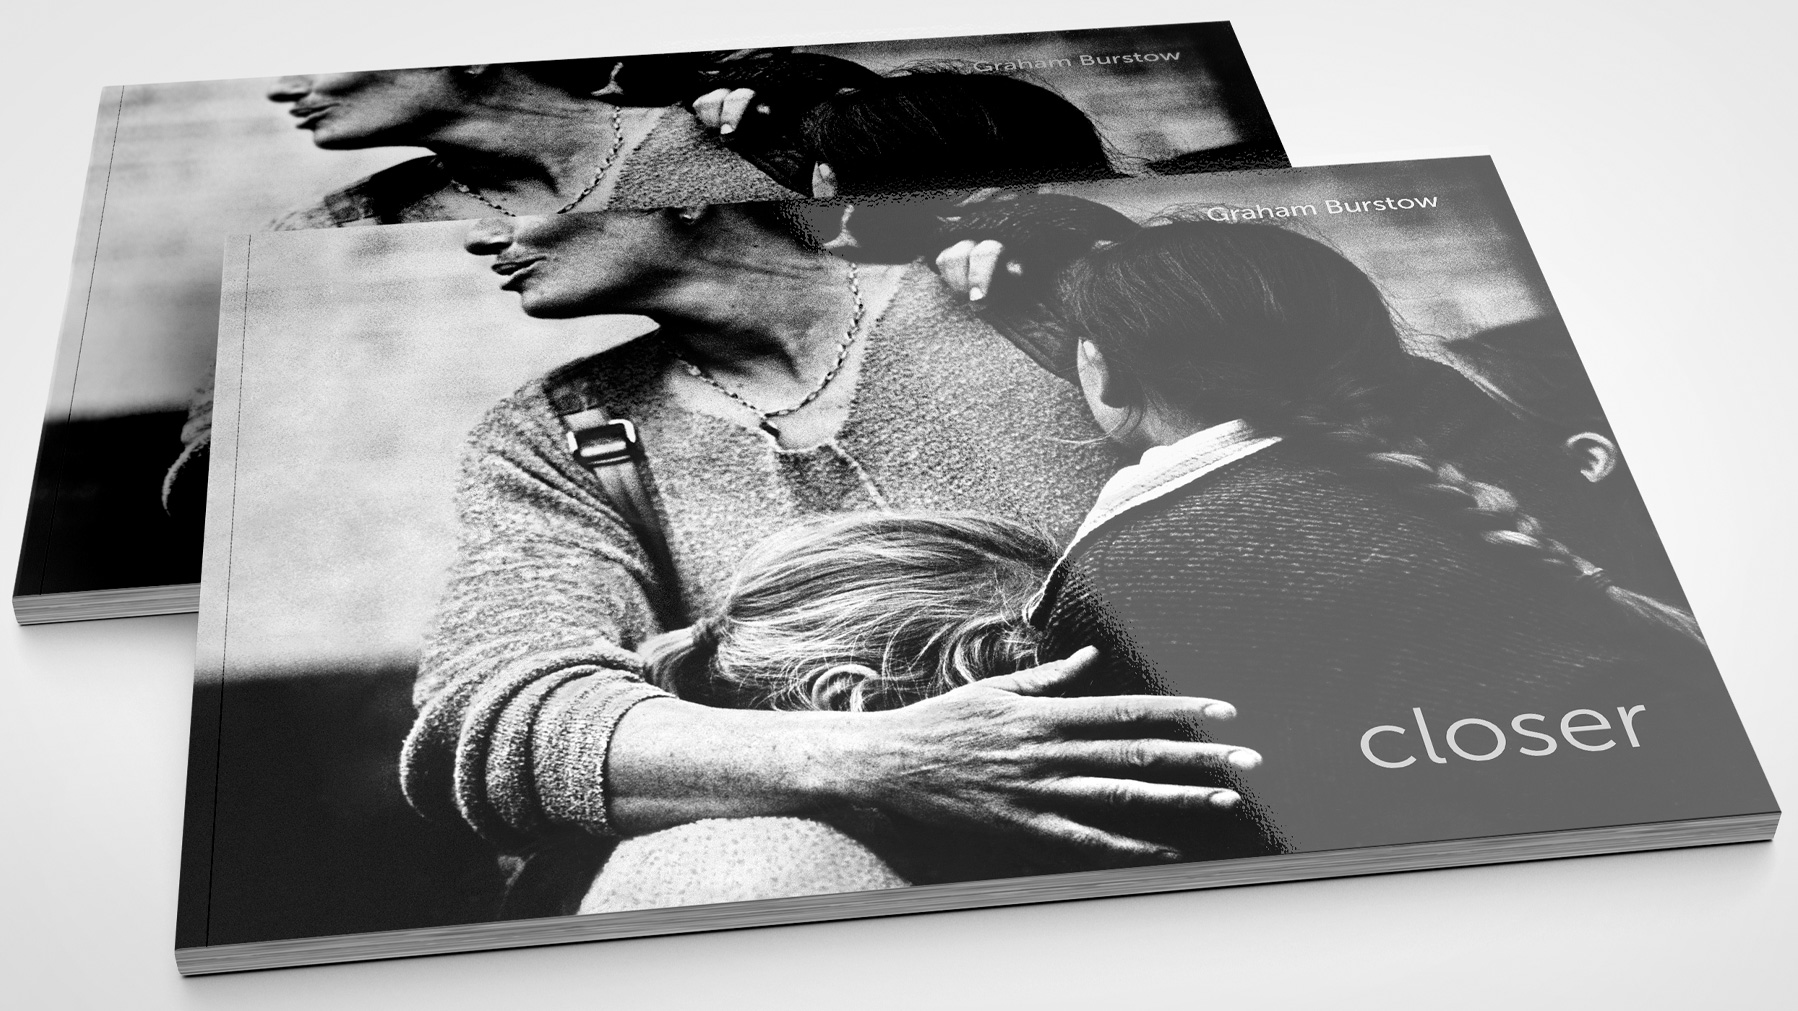 closer - the book